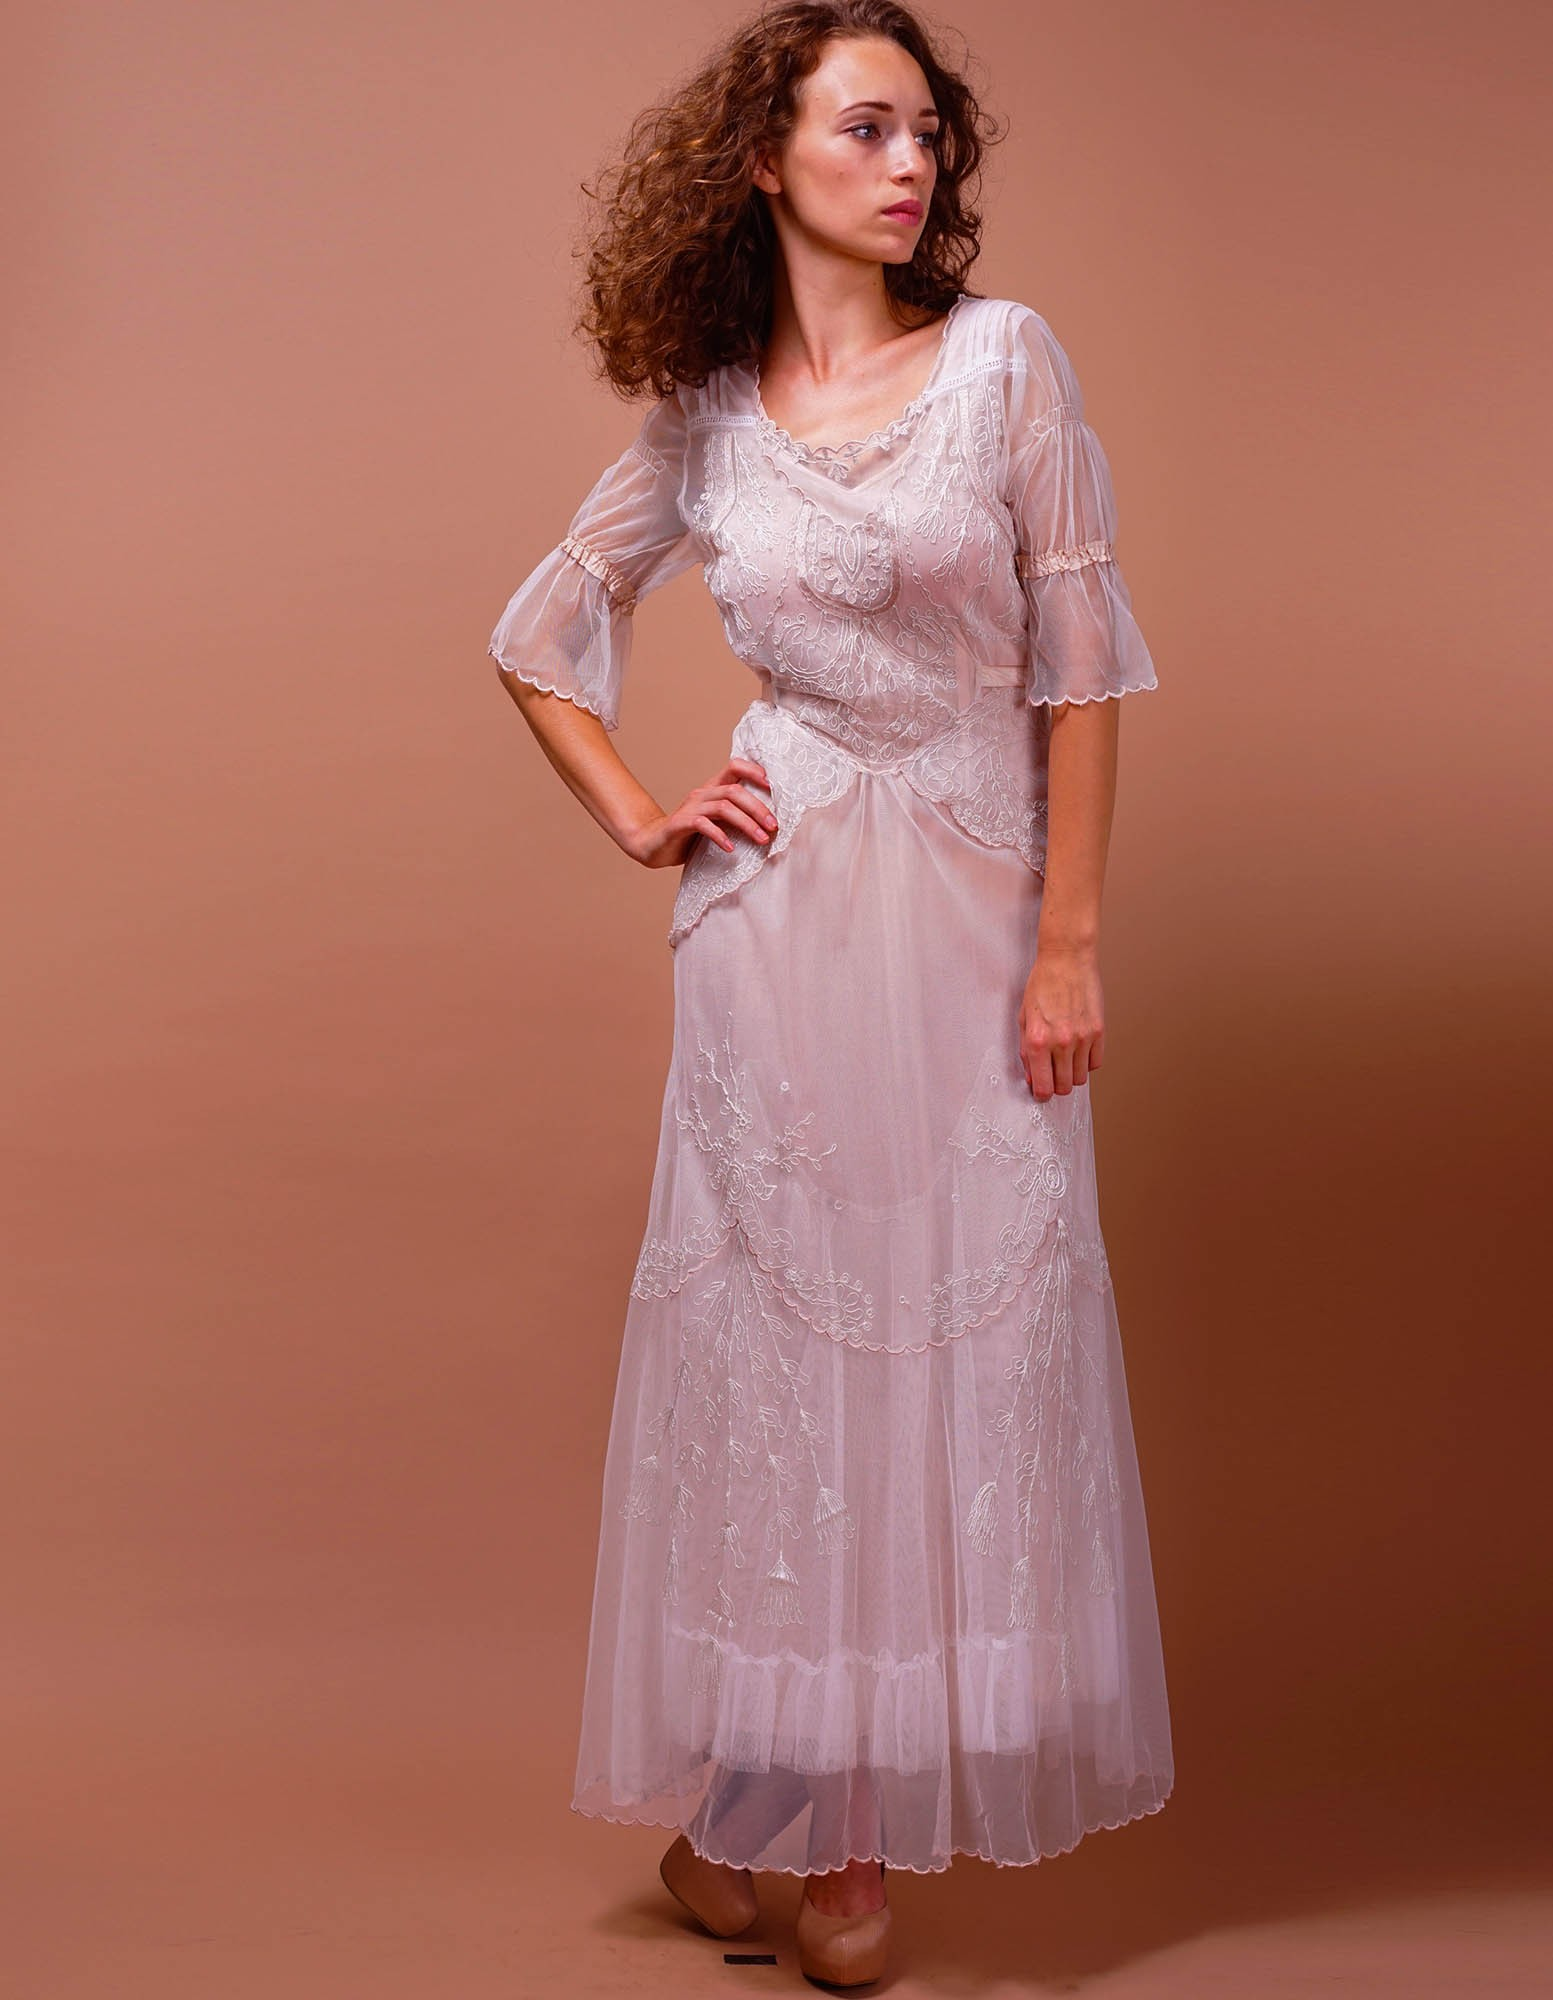 Edwardian Vintage Inspired Wedding Dress in Ivory-Blush by Nataya